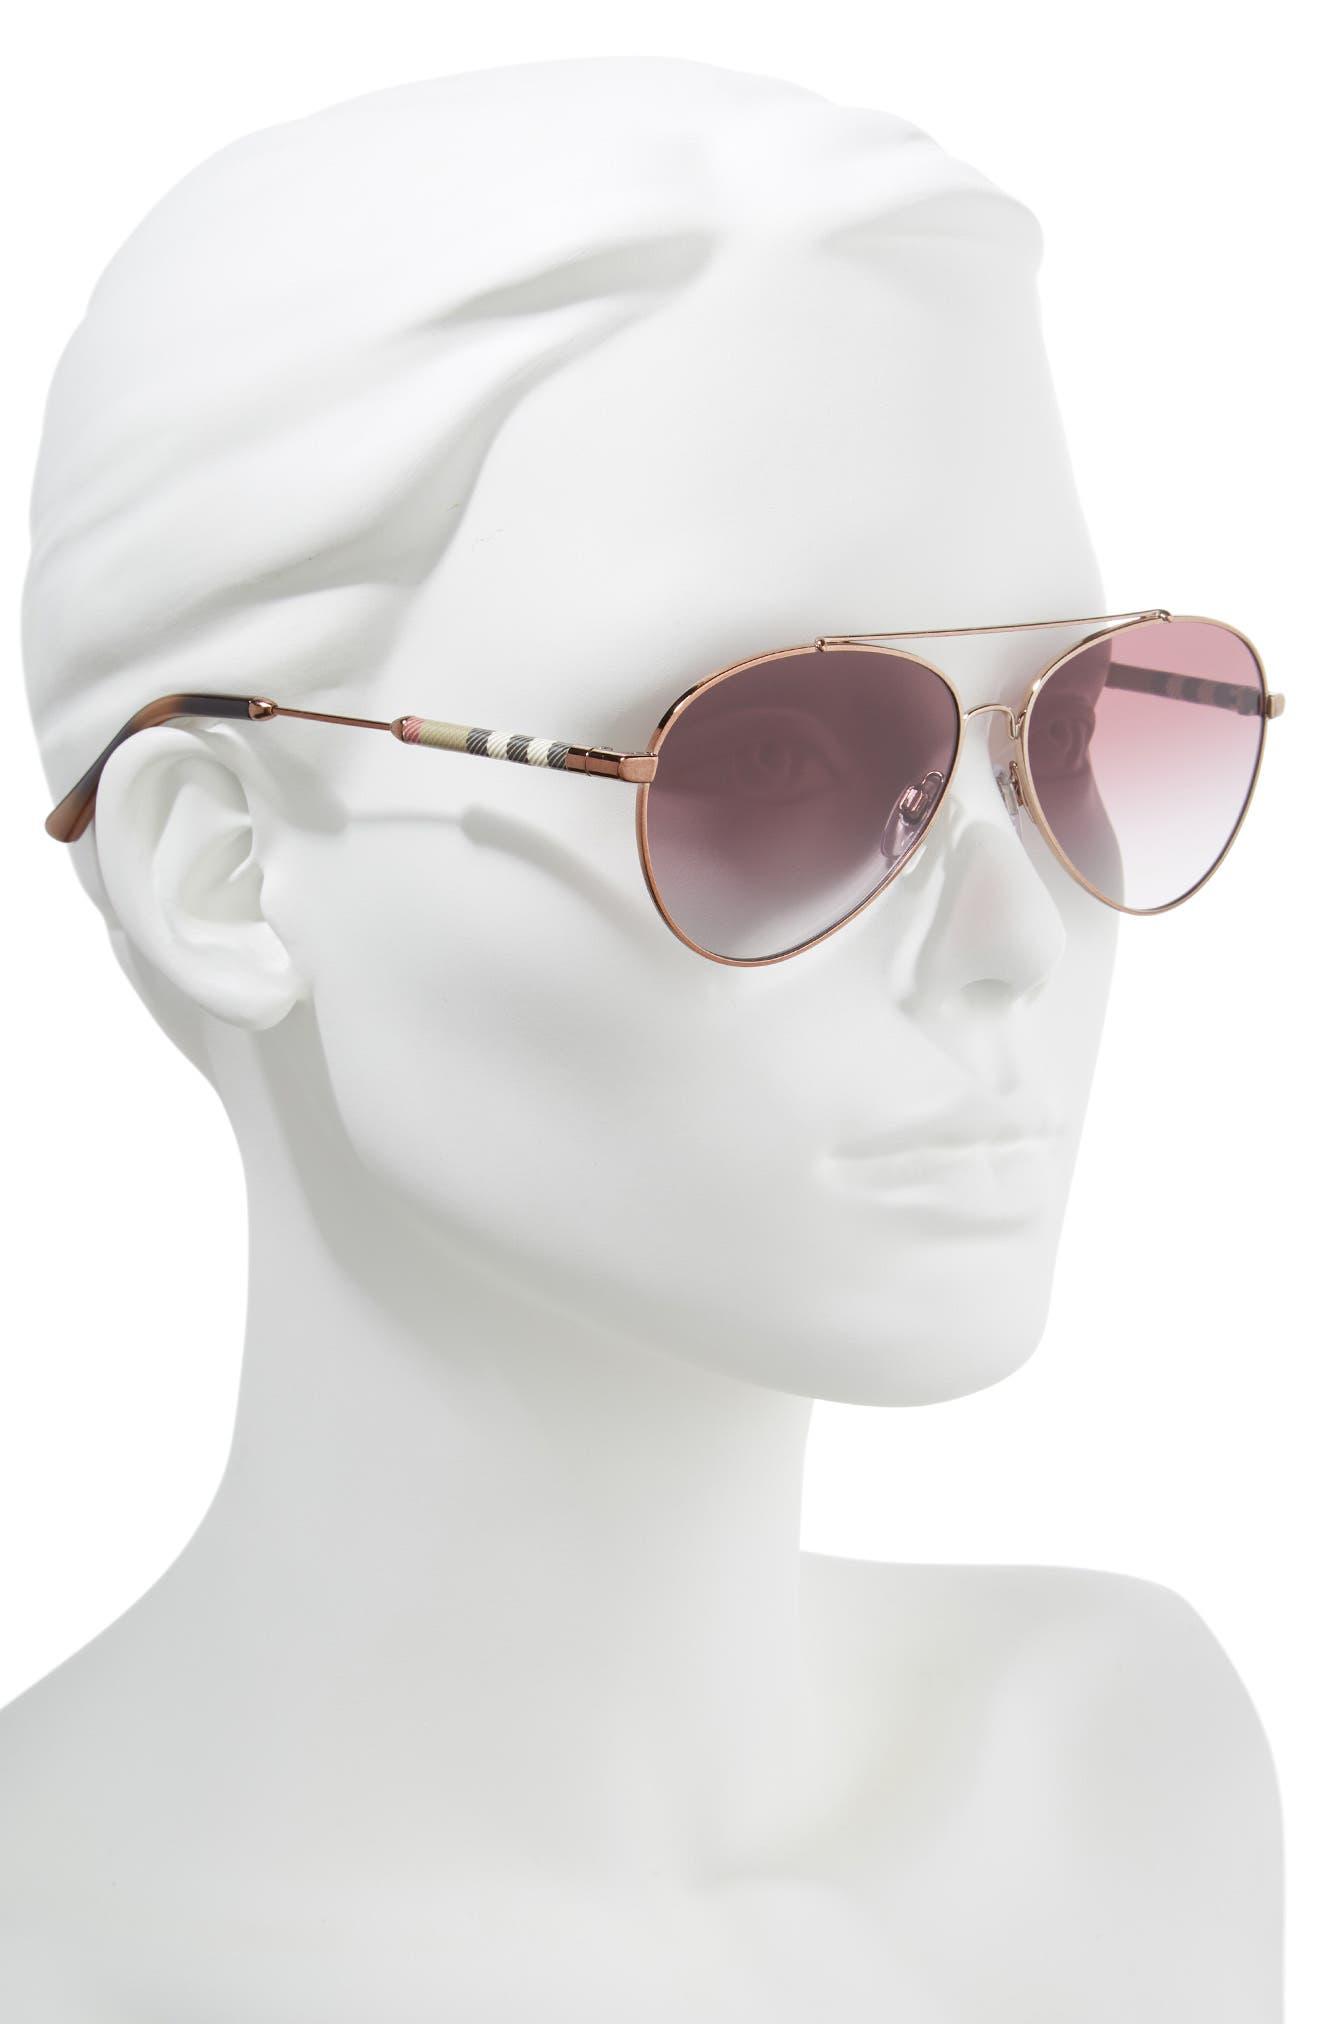 57mm Mirrored Aviator Sunglasses,                             Alternate thumbnail 2, color,                             VIOLET GRADIENT